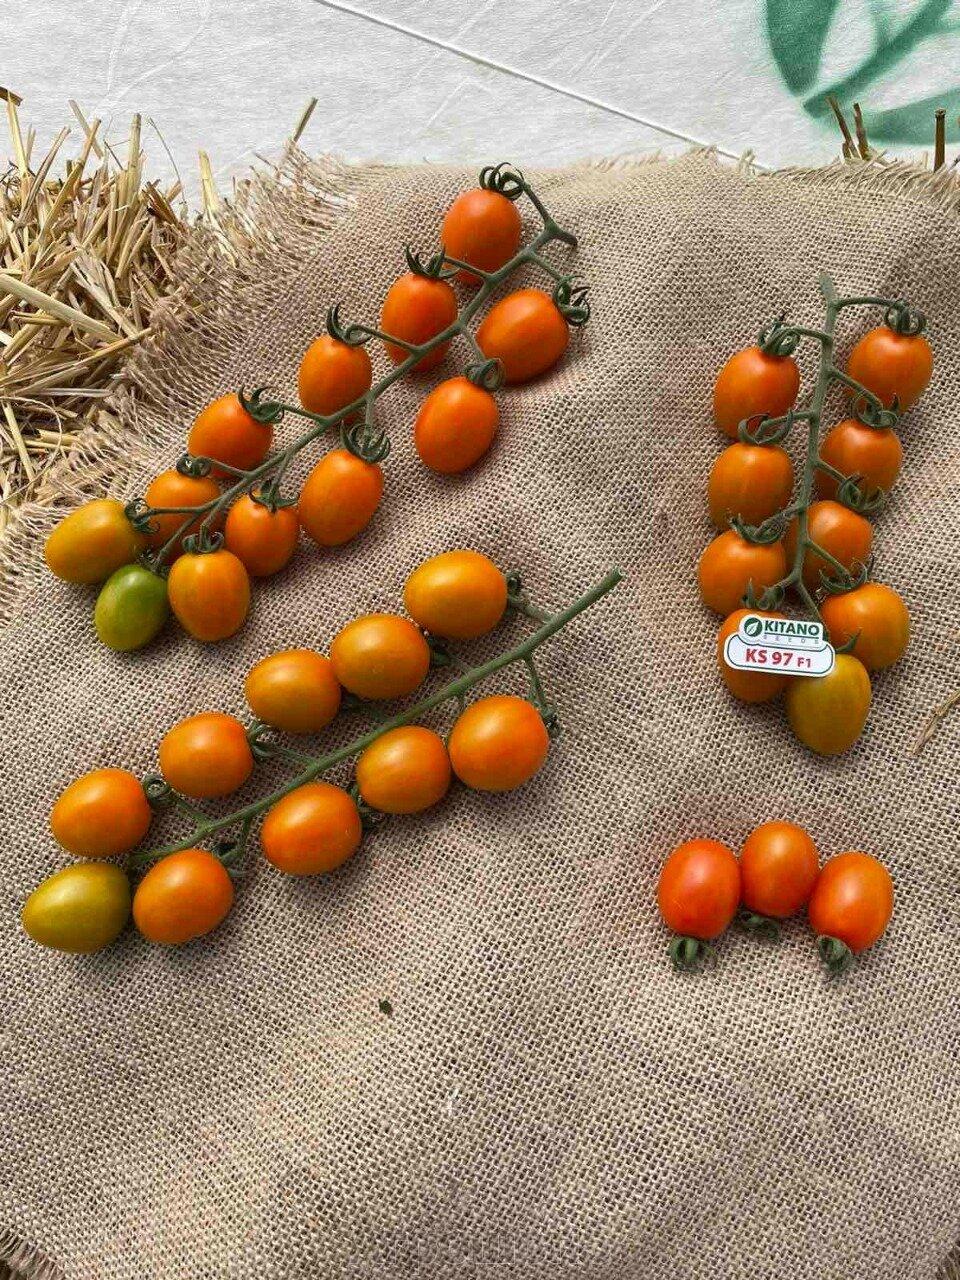 День поля по томатам от компании Kitano - фото pic_c265f96c7e6e3e18102f92adca9fd0c7_1920x9000_1.jpg